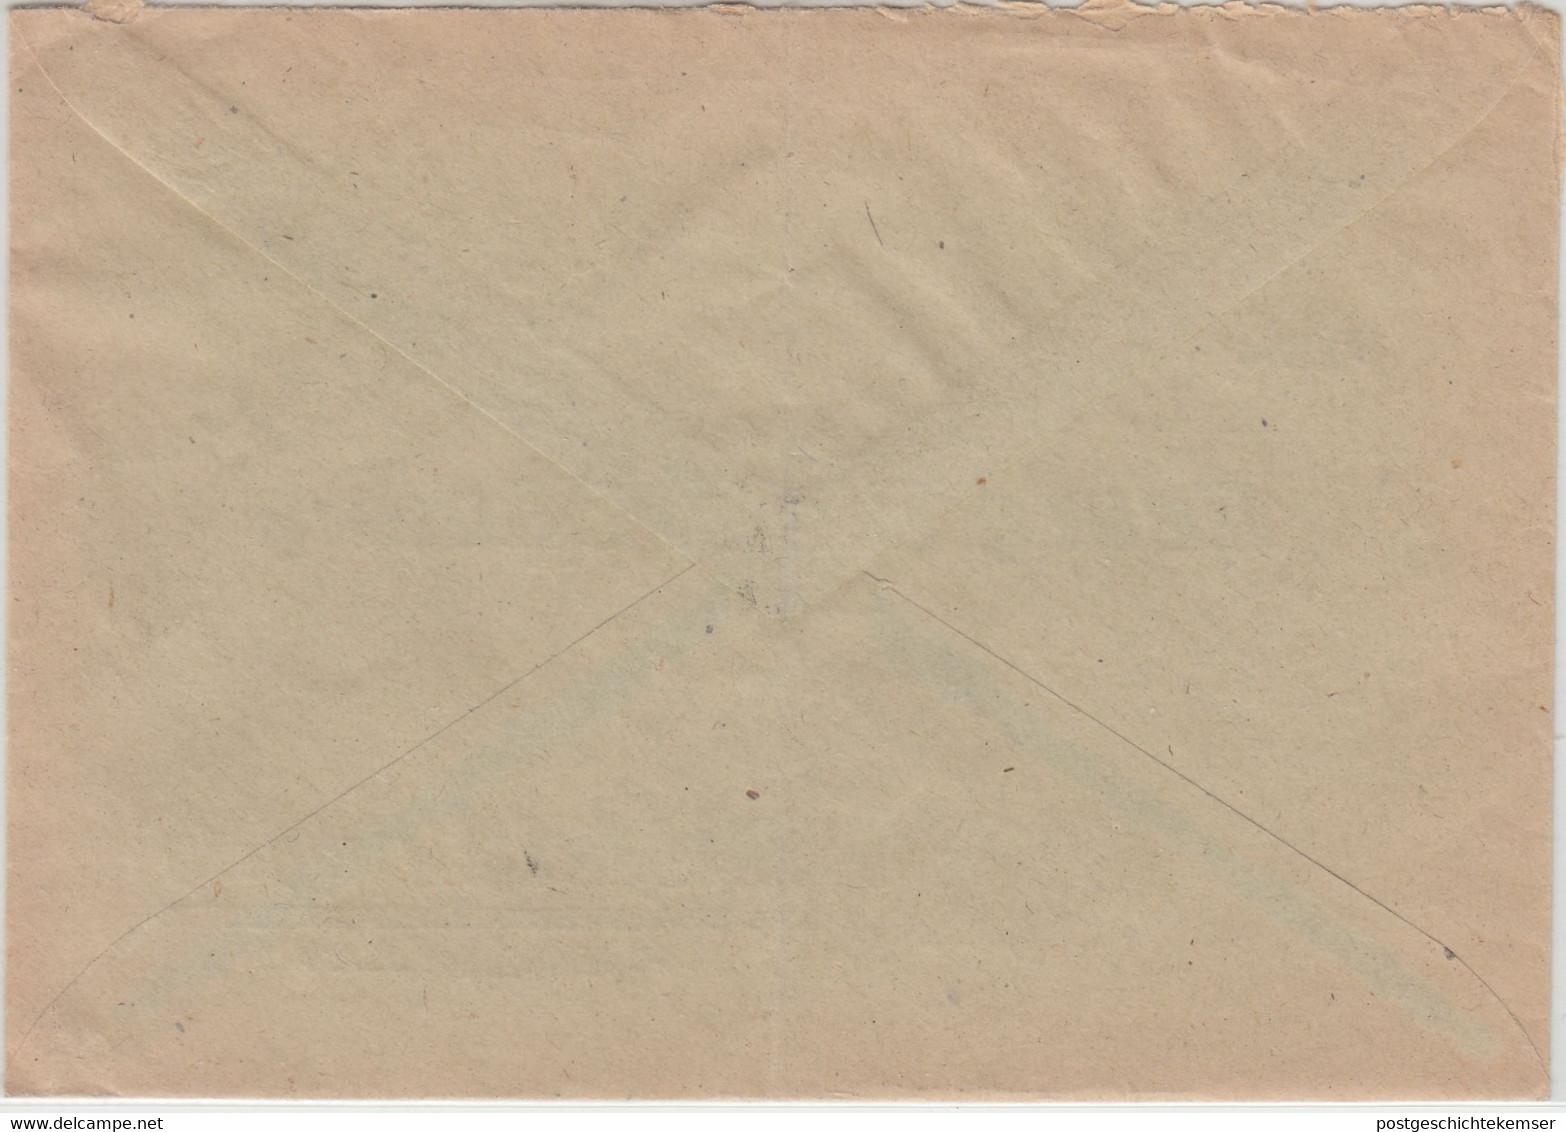 Bizone - 2x10 Pfg. Goethe Brief Limburg - Alsfeld 1950 - Zona Anglo-Américan